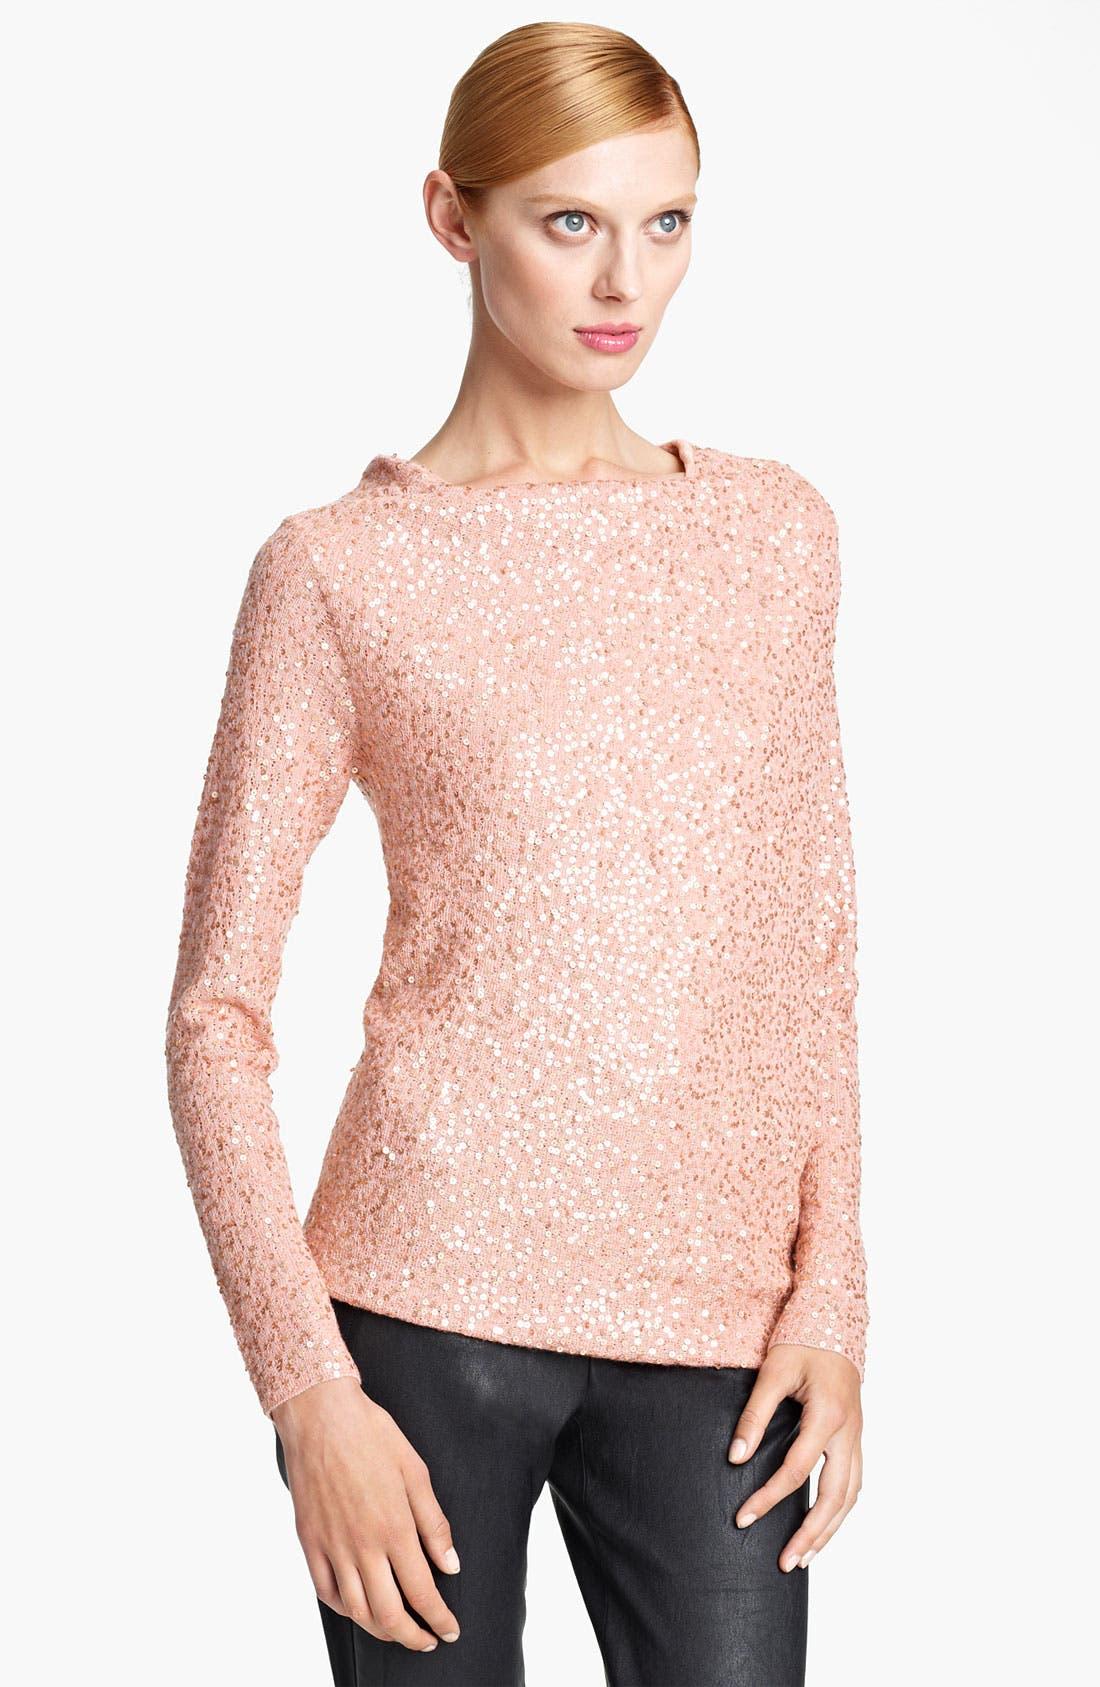 Alternate Image 1 Selected - Donna Karan Collection Sequin Cashmere & Silk Top